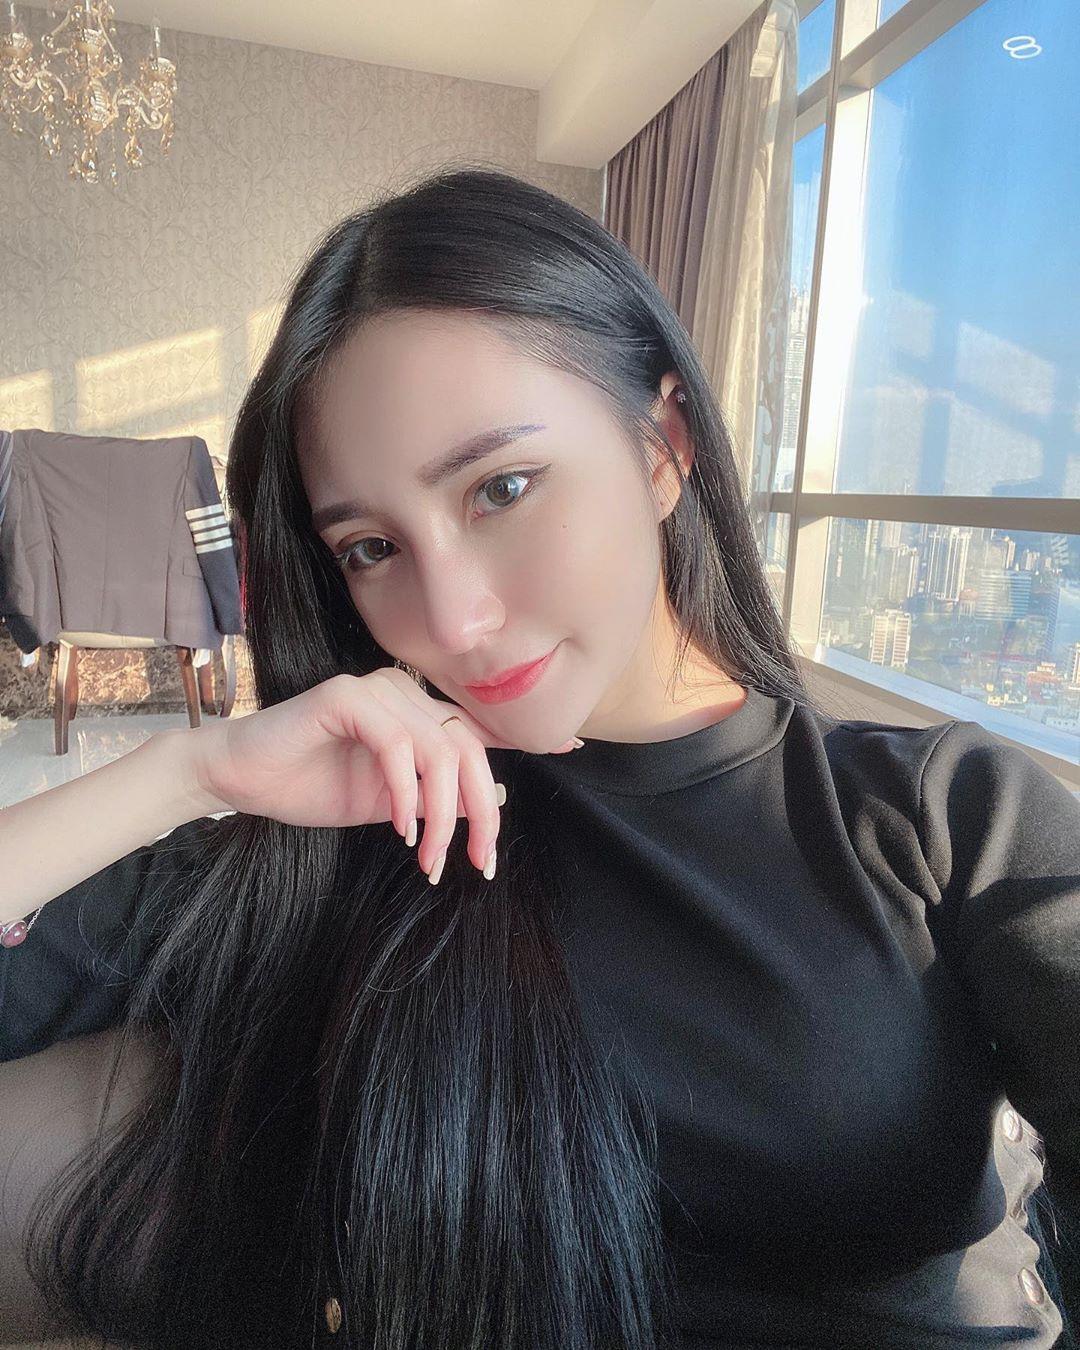 Vivian Ying薇薇恩  嫩白核彈美乳.....視覺upup震撼 - 美女圖 -